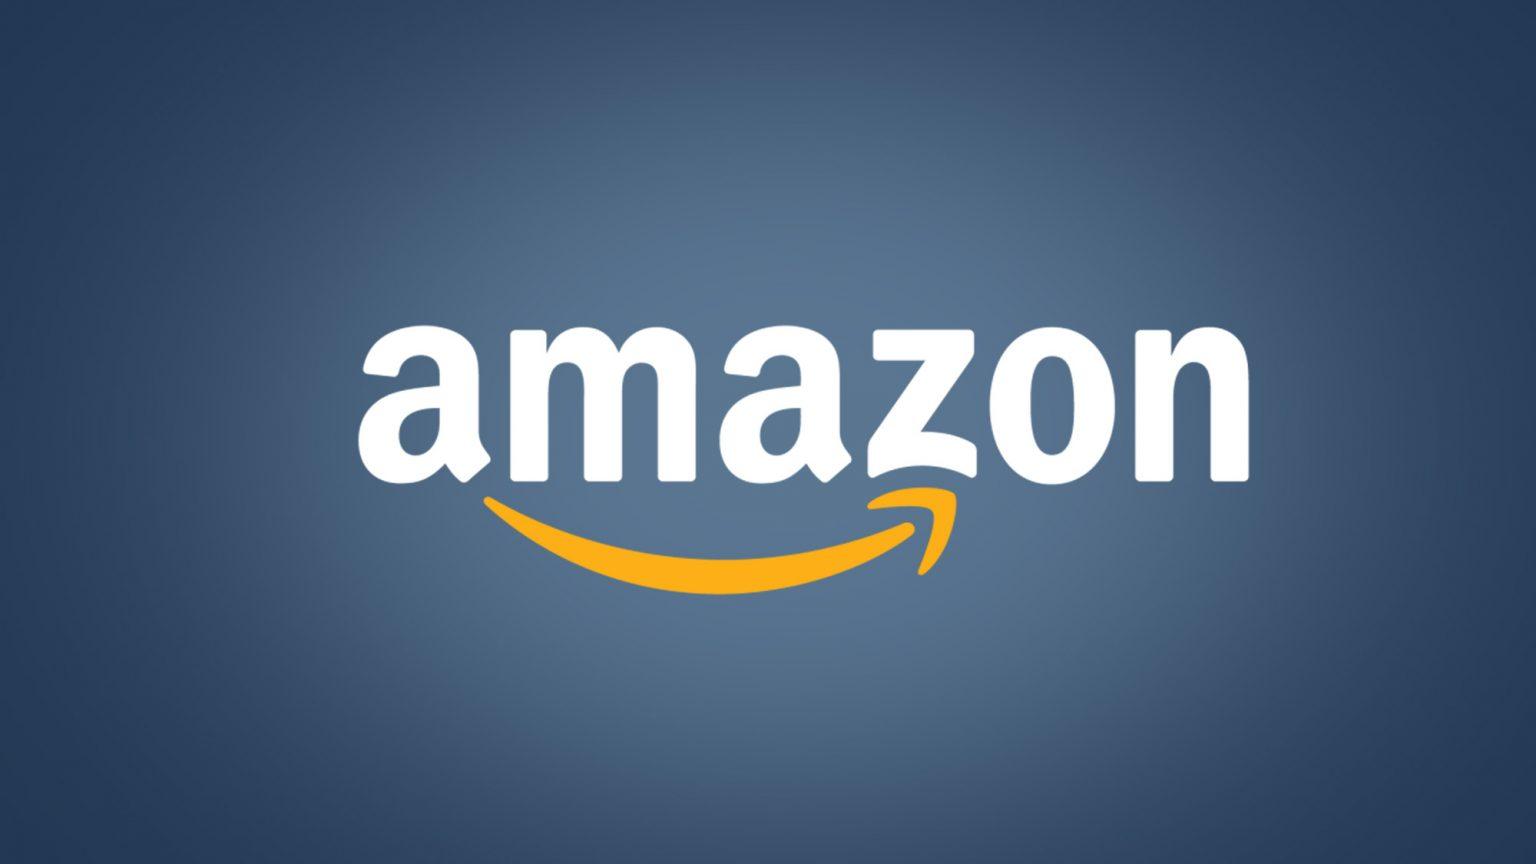 Amazon selling business.